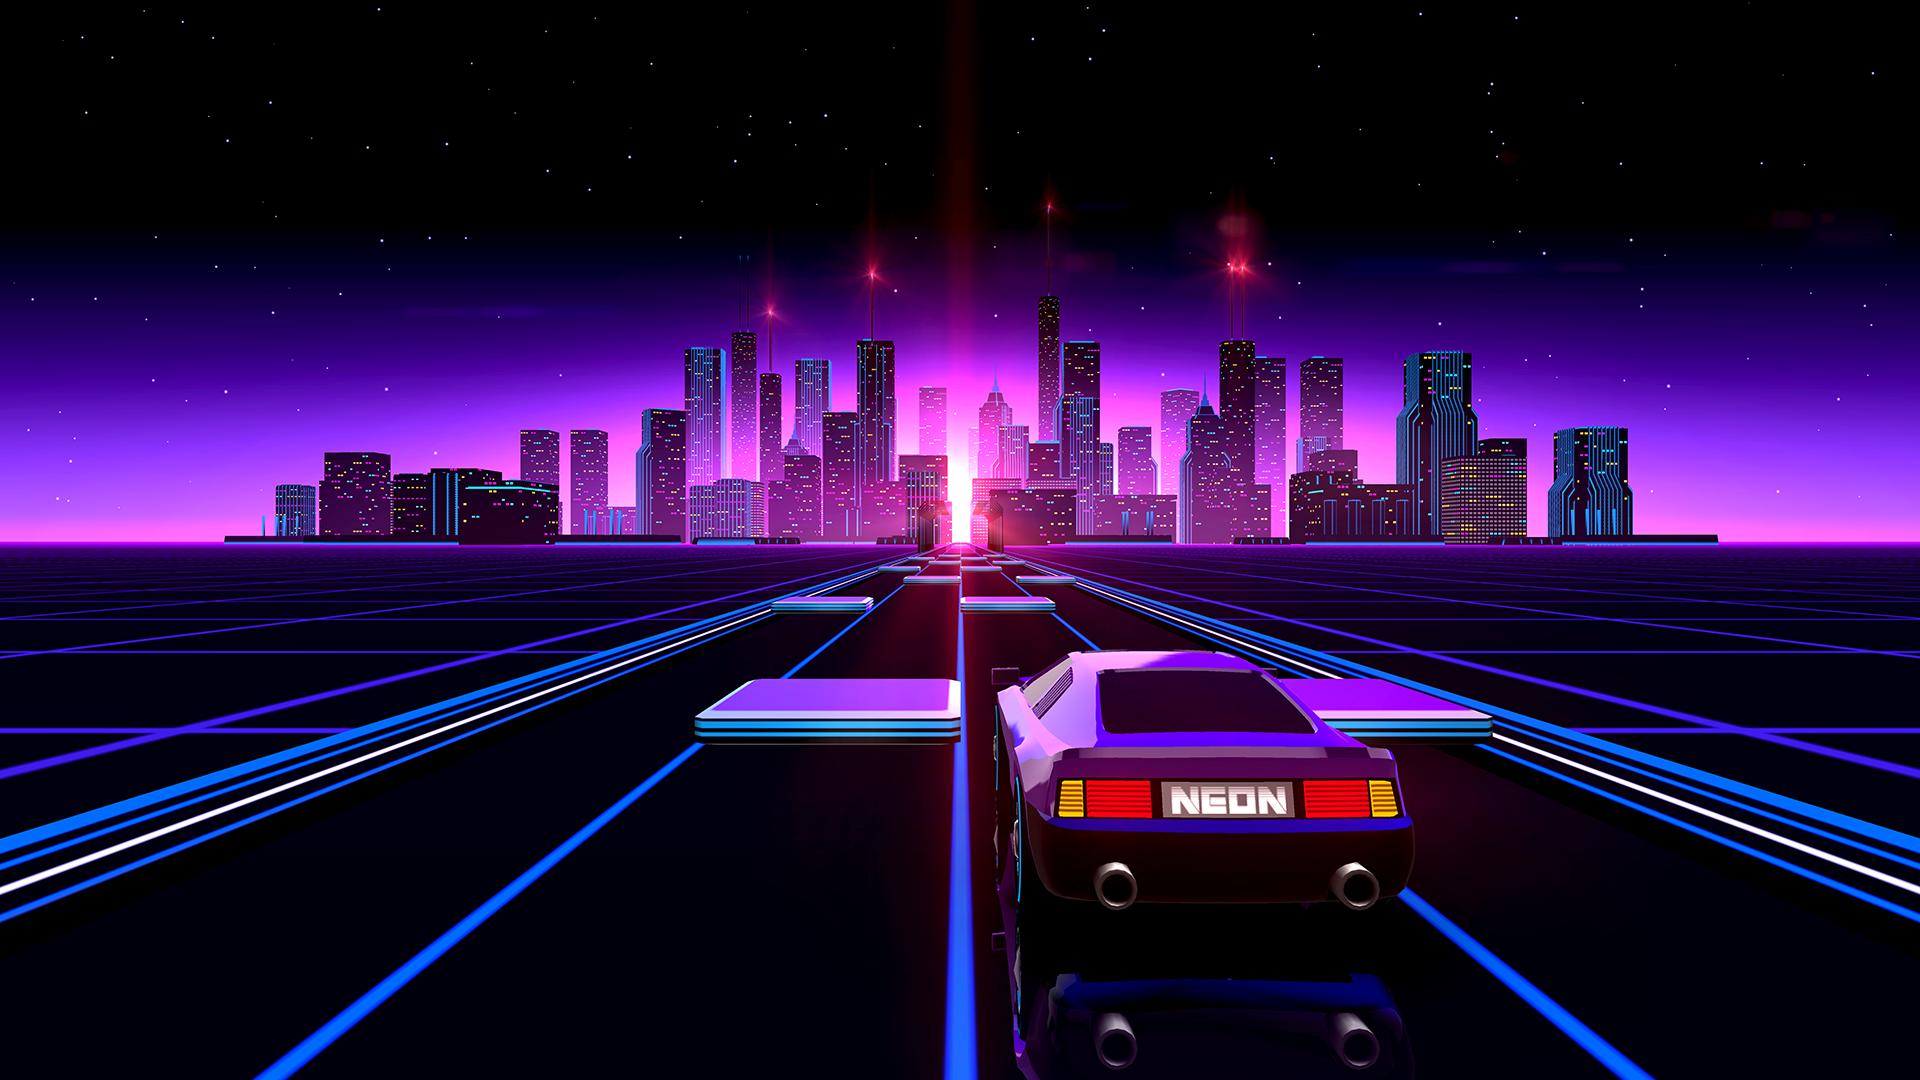 Chill Wave Car Wallpaper Neon Drive City Image Mod Db